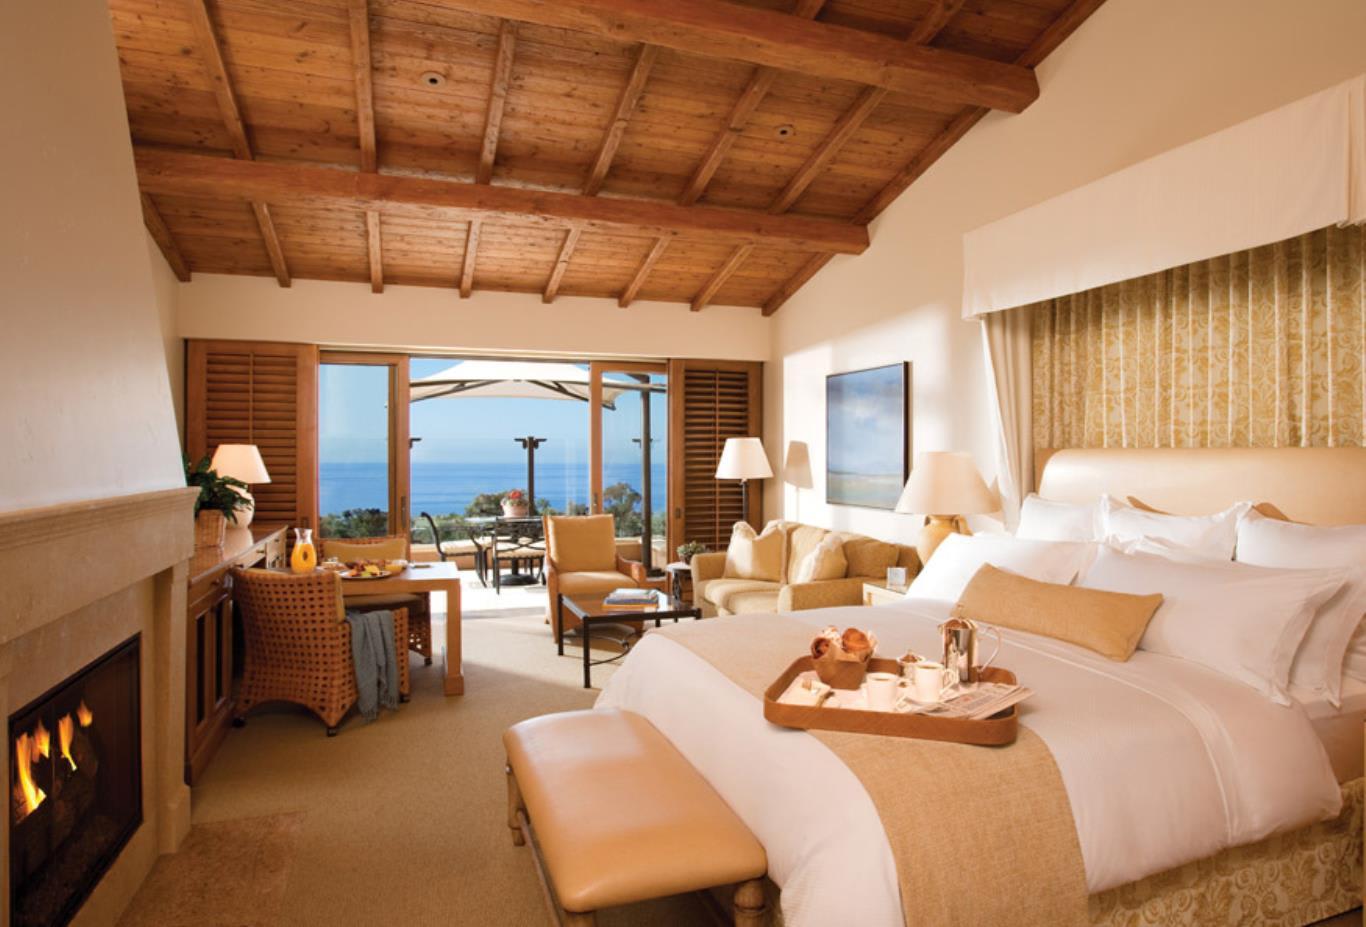 Bungalow Guest Room